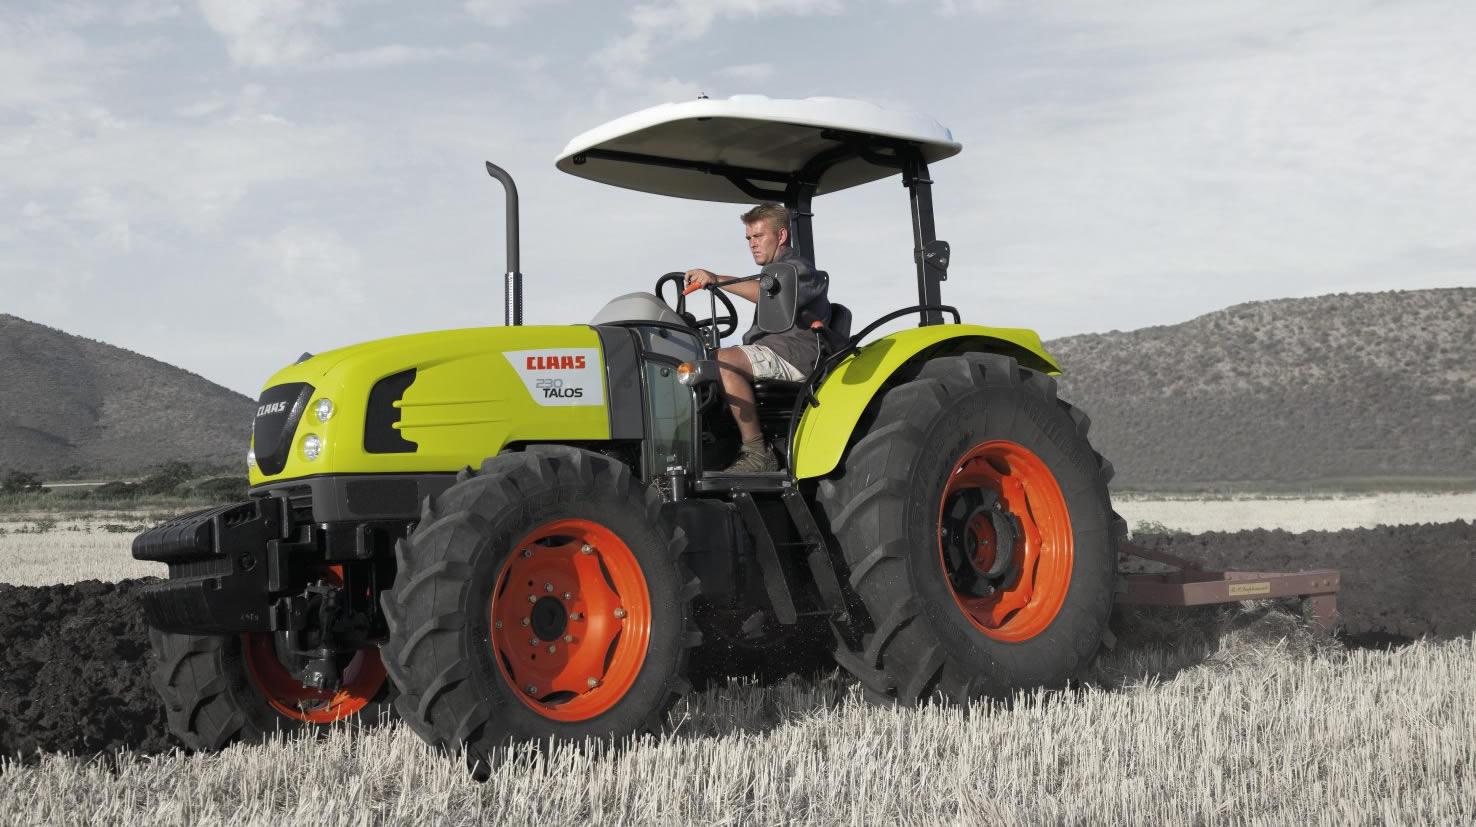 Claas Tractors Www Imgkid Com The Image Kid Has It